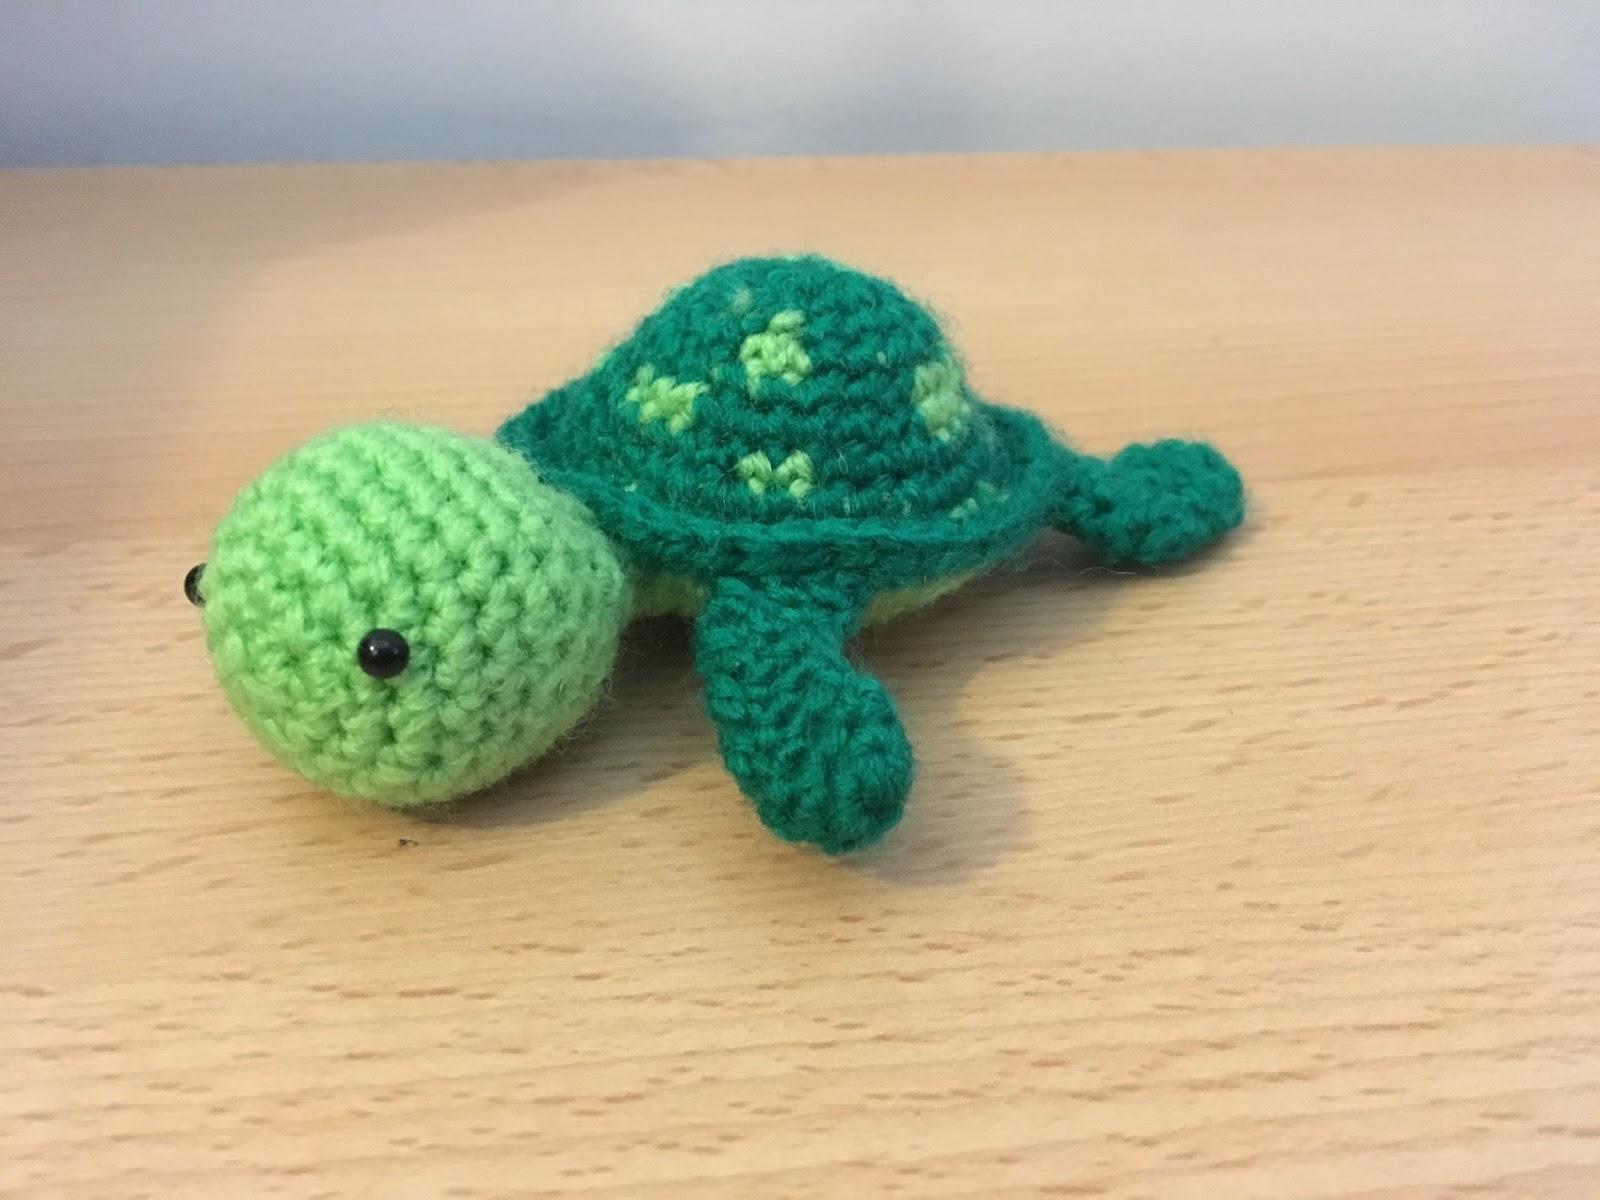 Amigurumi Crochet Turtle : Crochet... Amigurumi : Mini Turtle